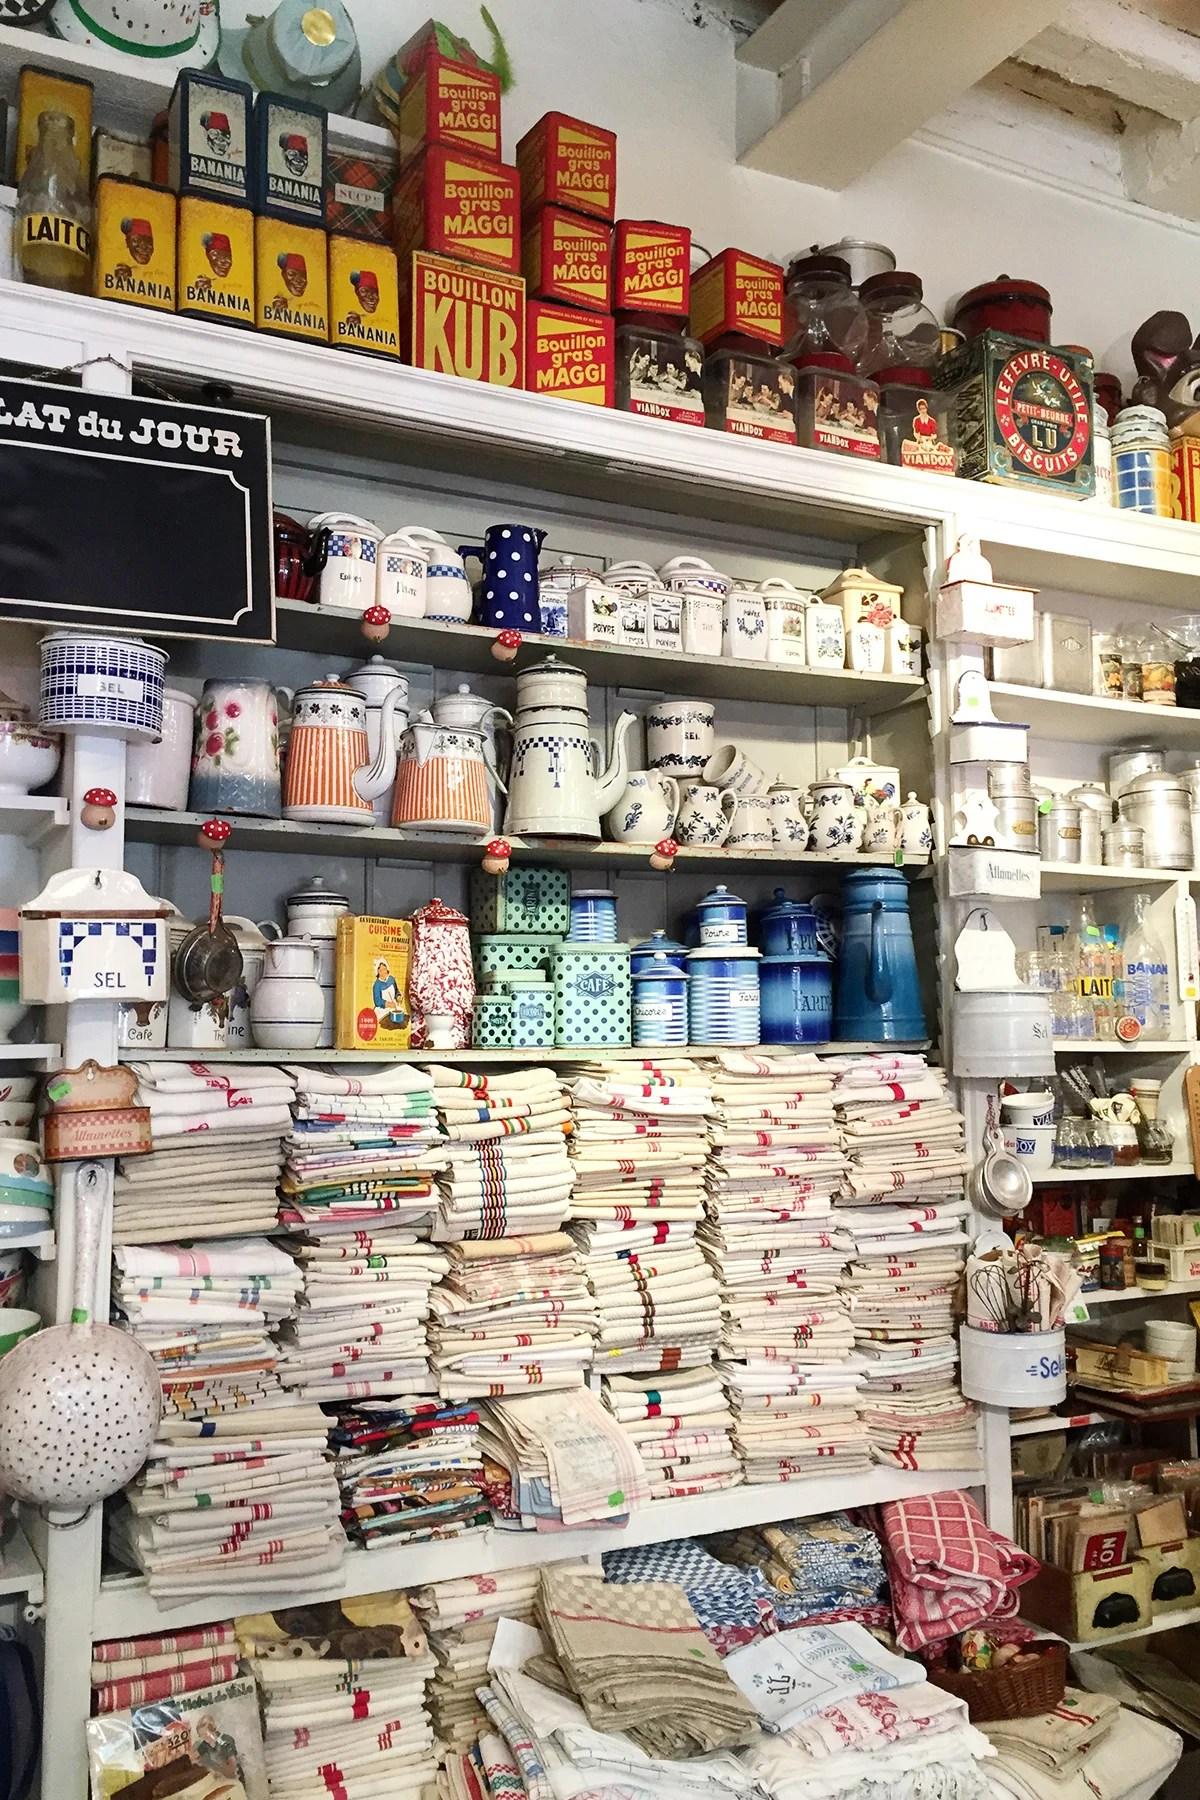 Shopping In Paris: Tips for Finding Hidden Treasures